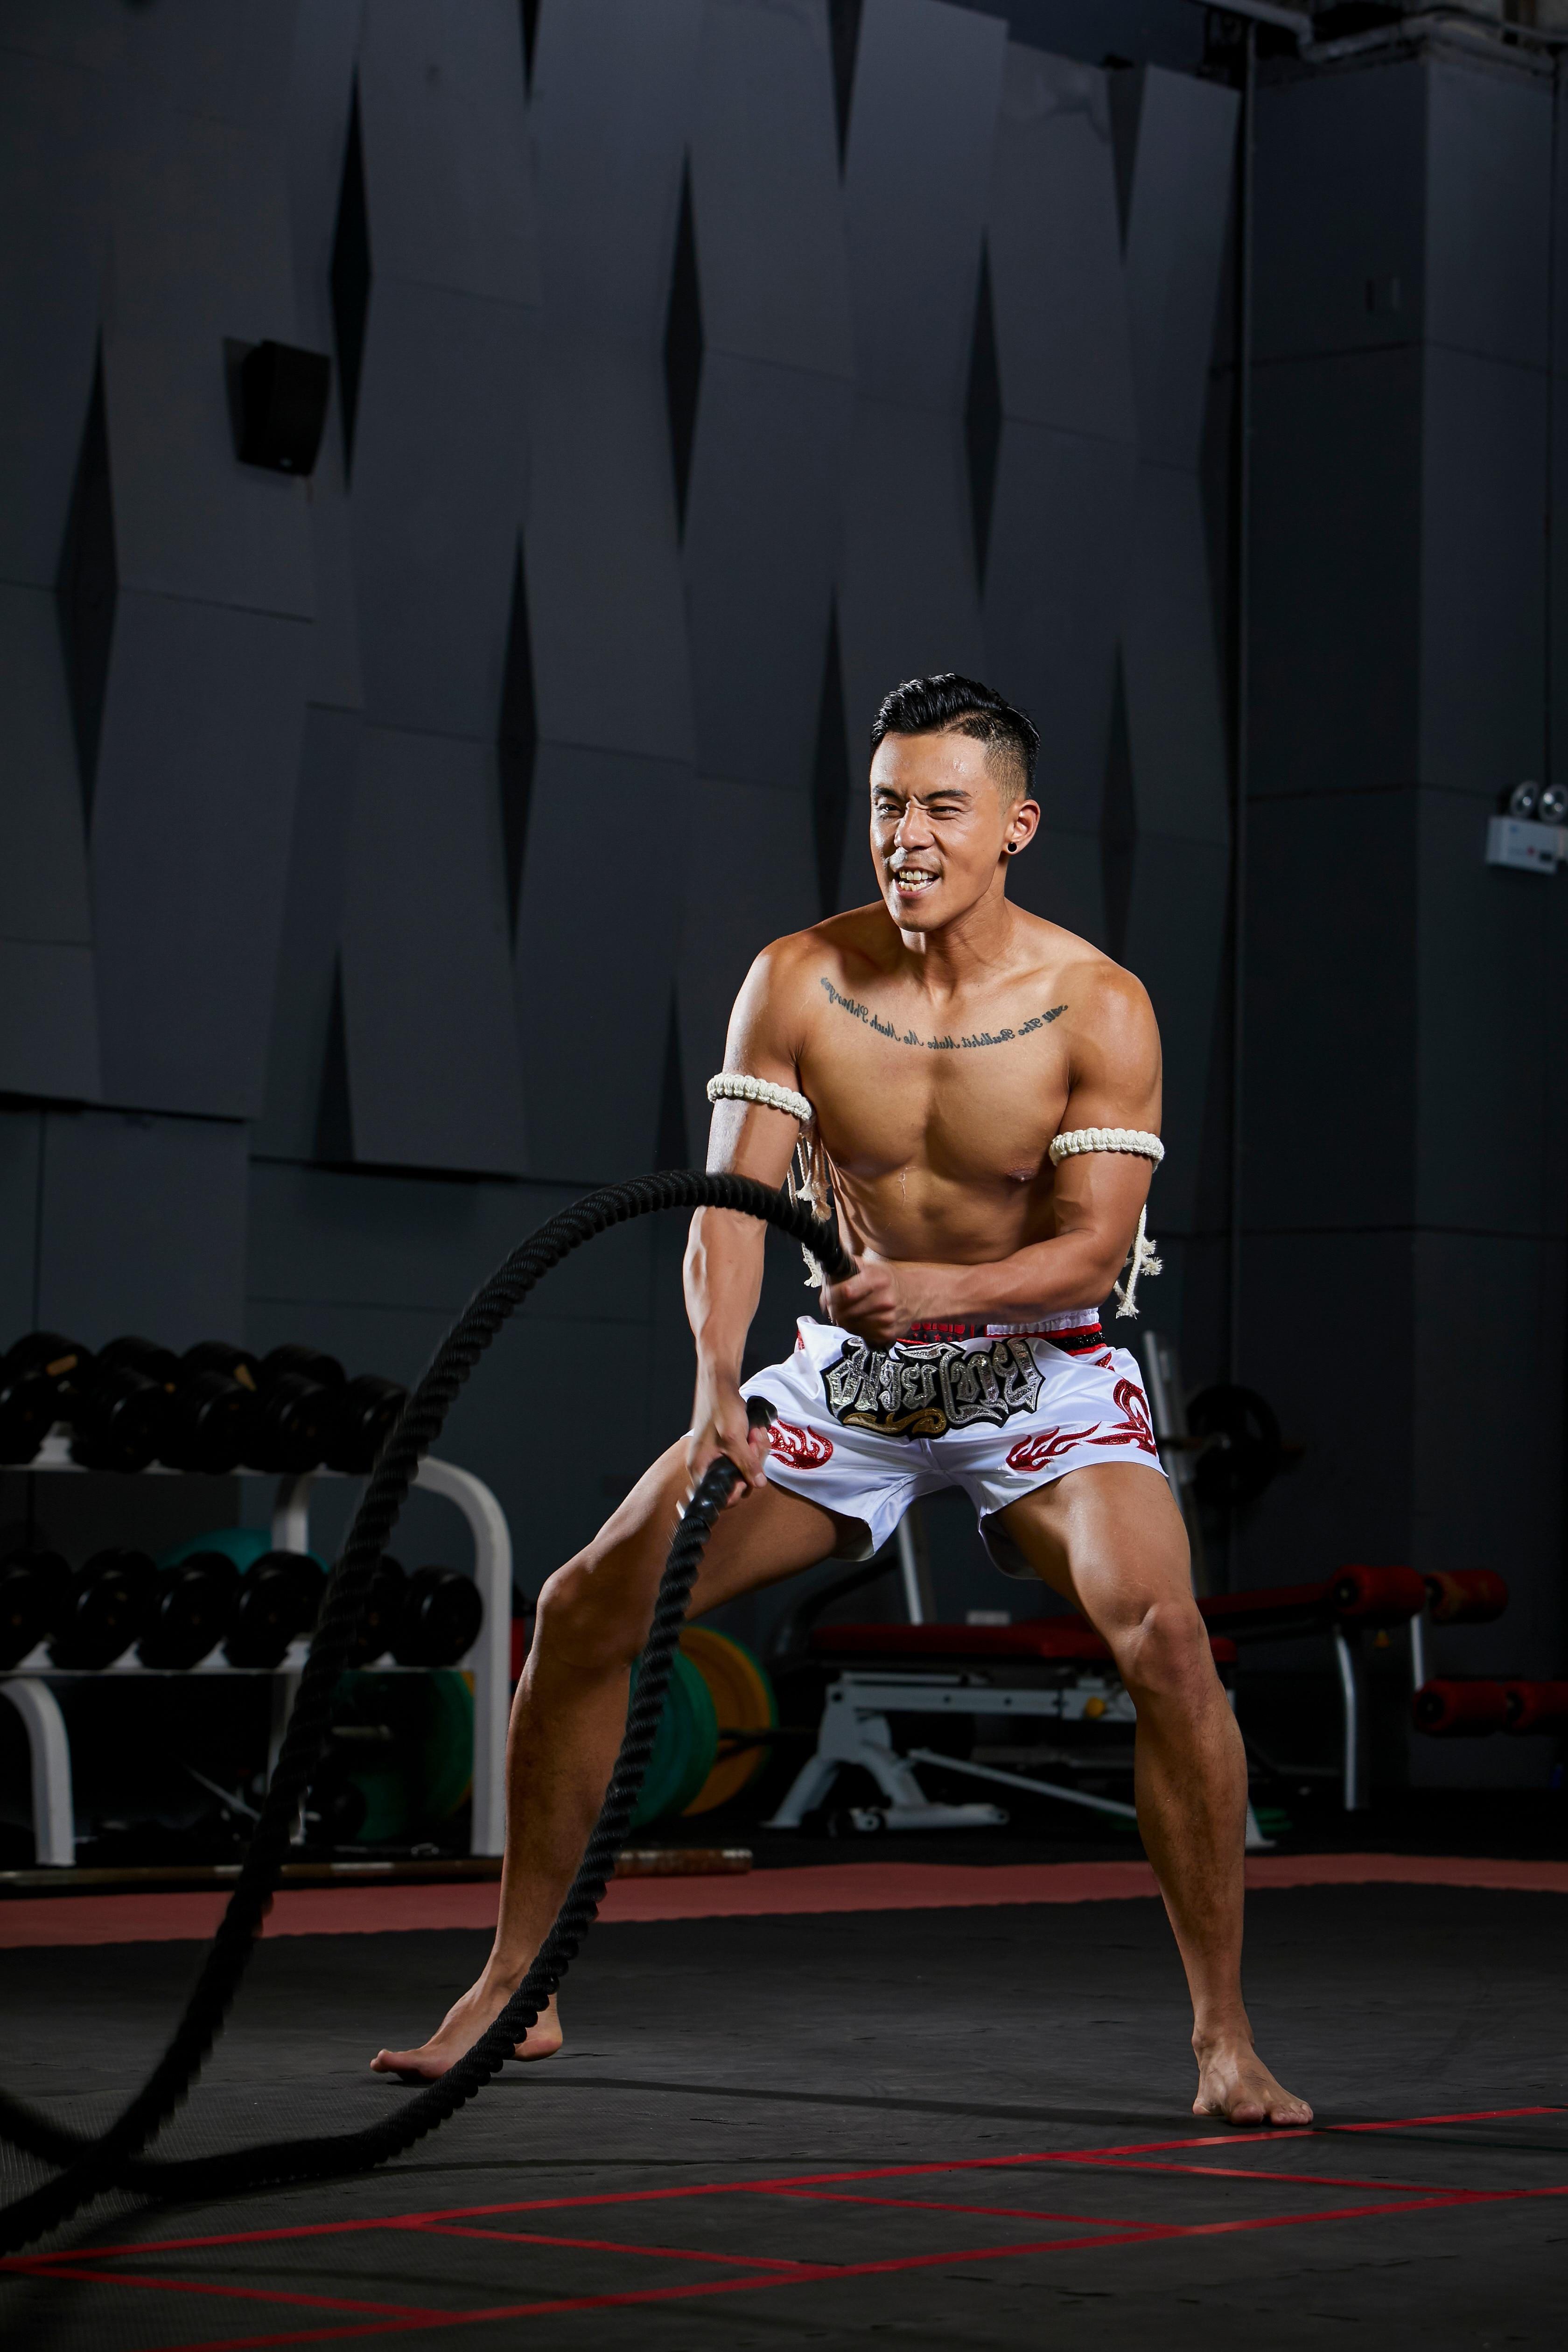 PUGILIST flame series white Thai pants mma shorts fighting shorts bodybuilding martial arts training boxing sanshou